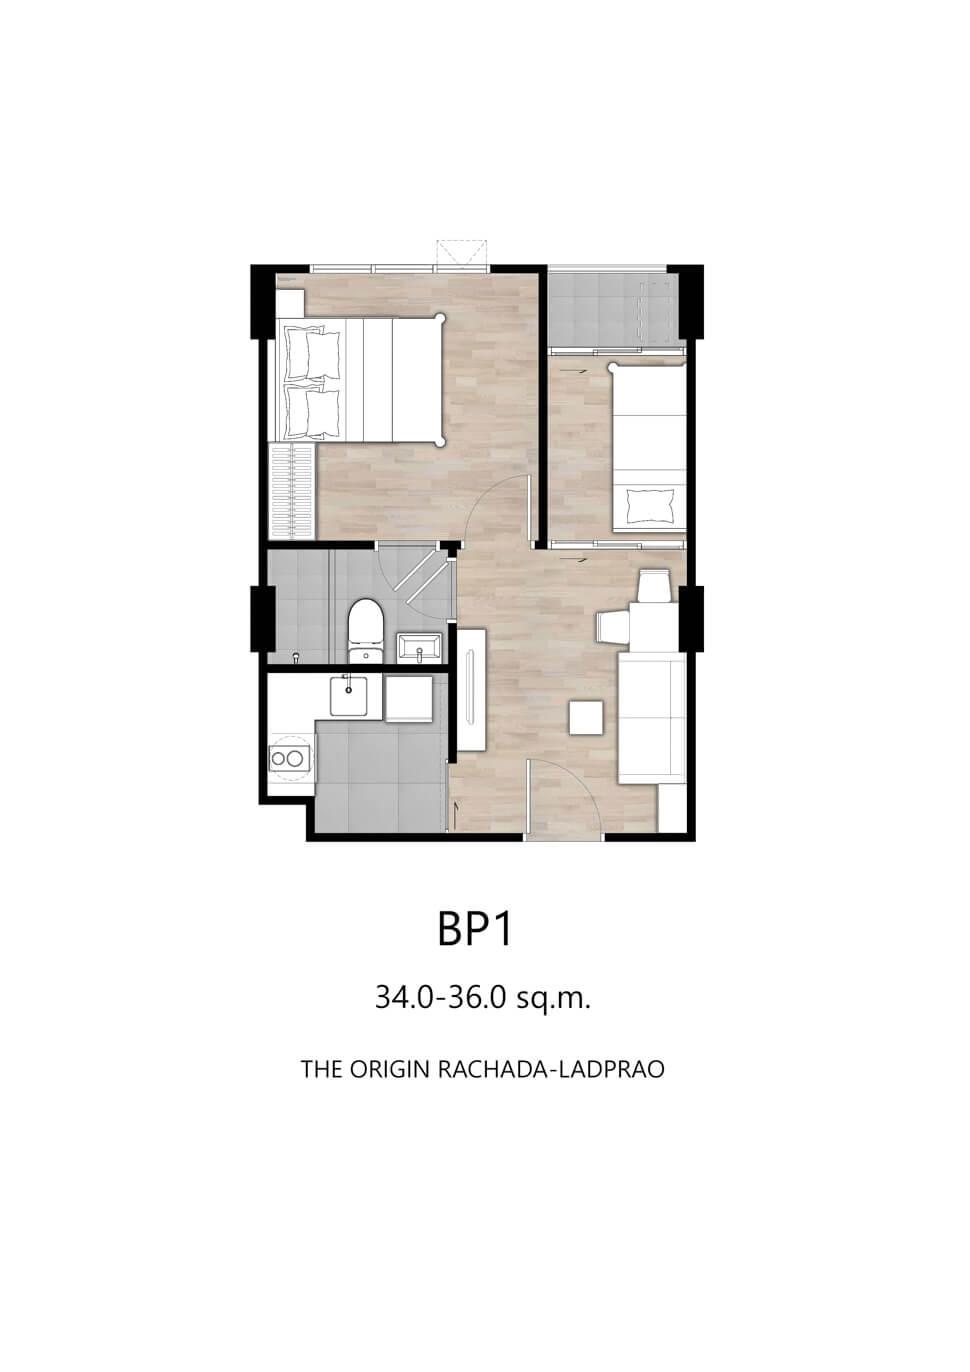 Review The Origin Ratchada Ladprao E.1 14